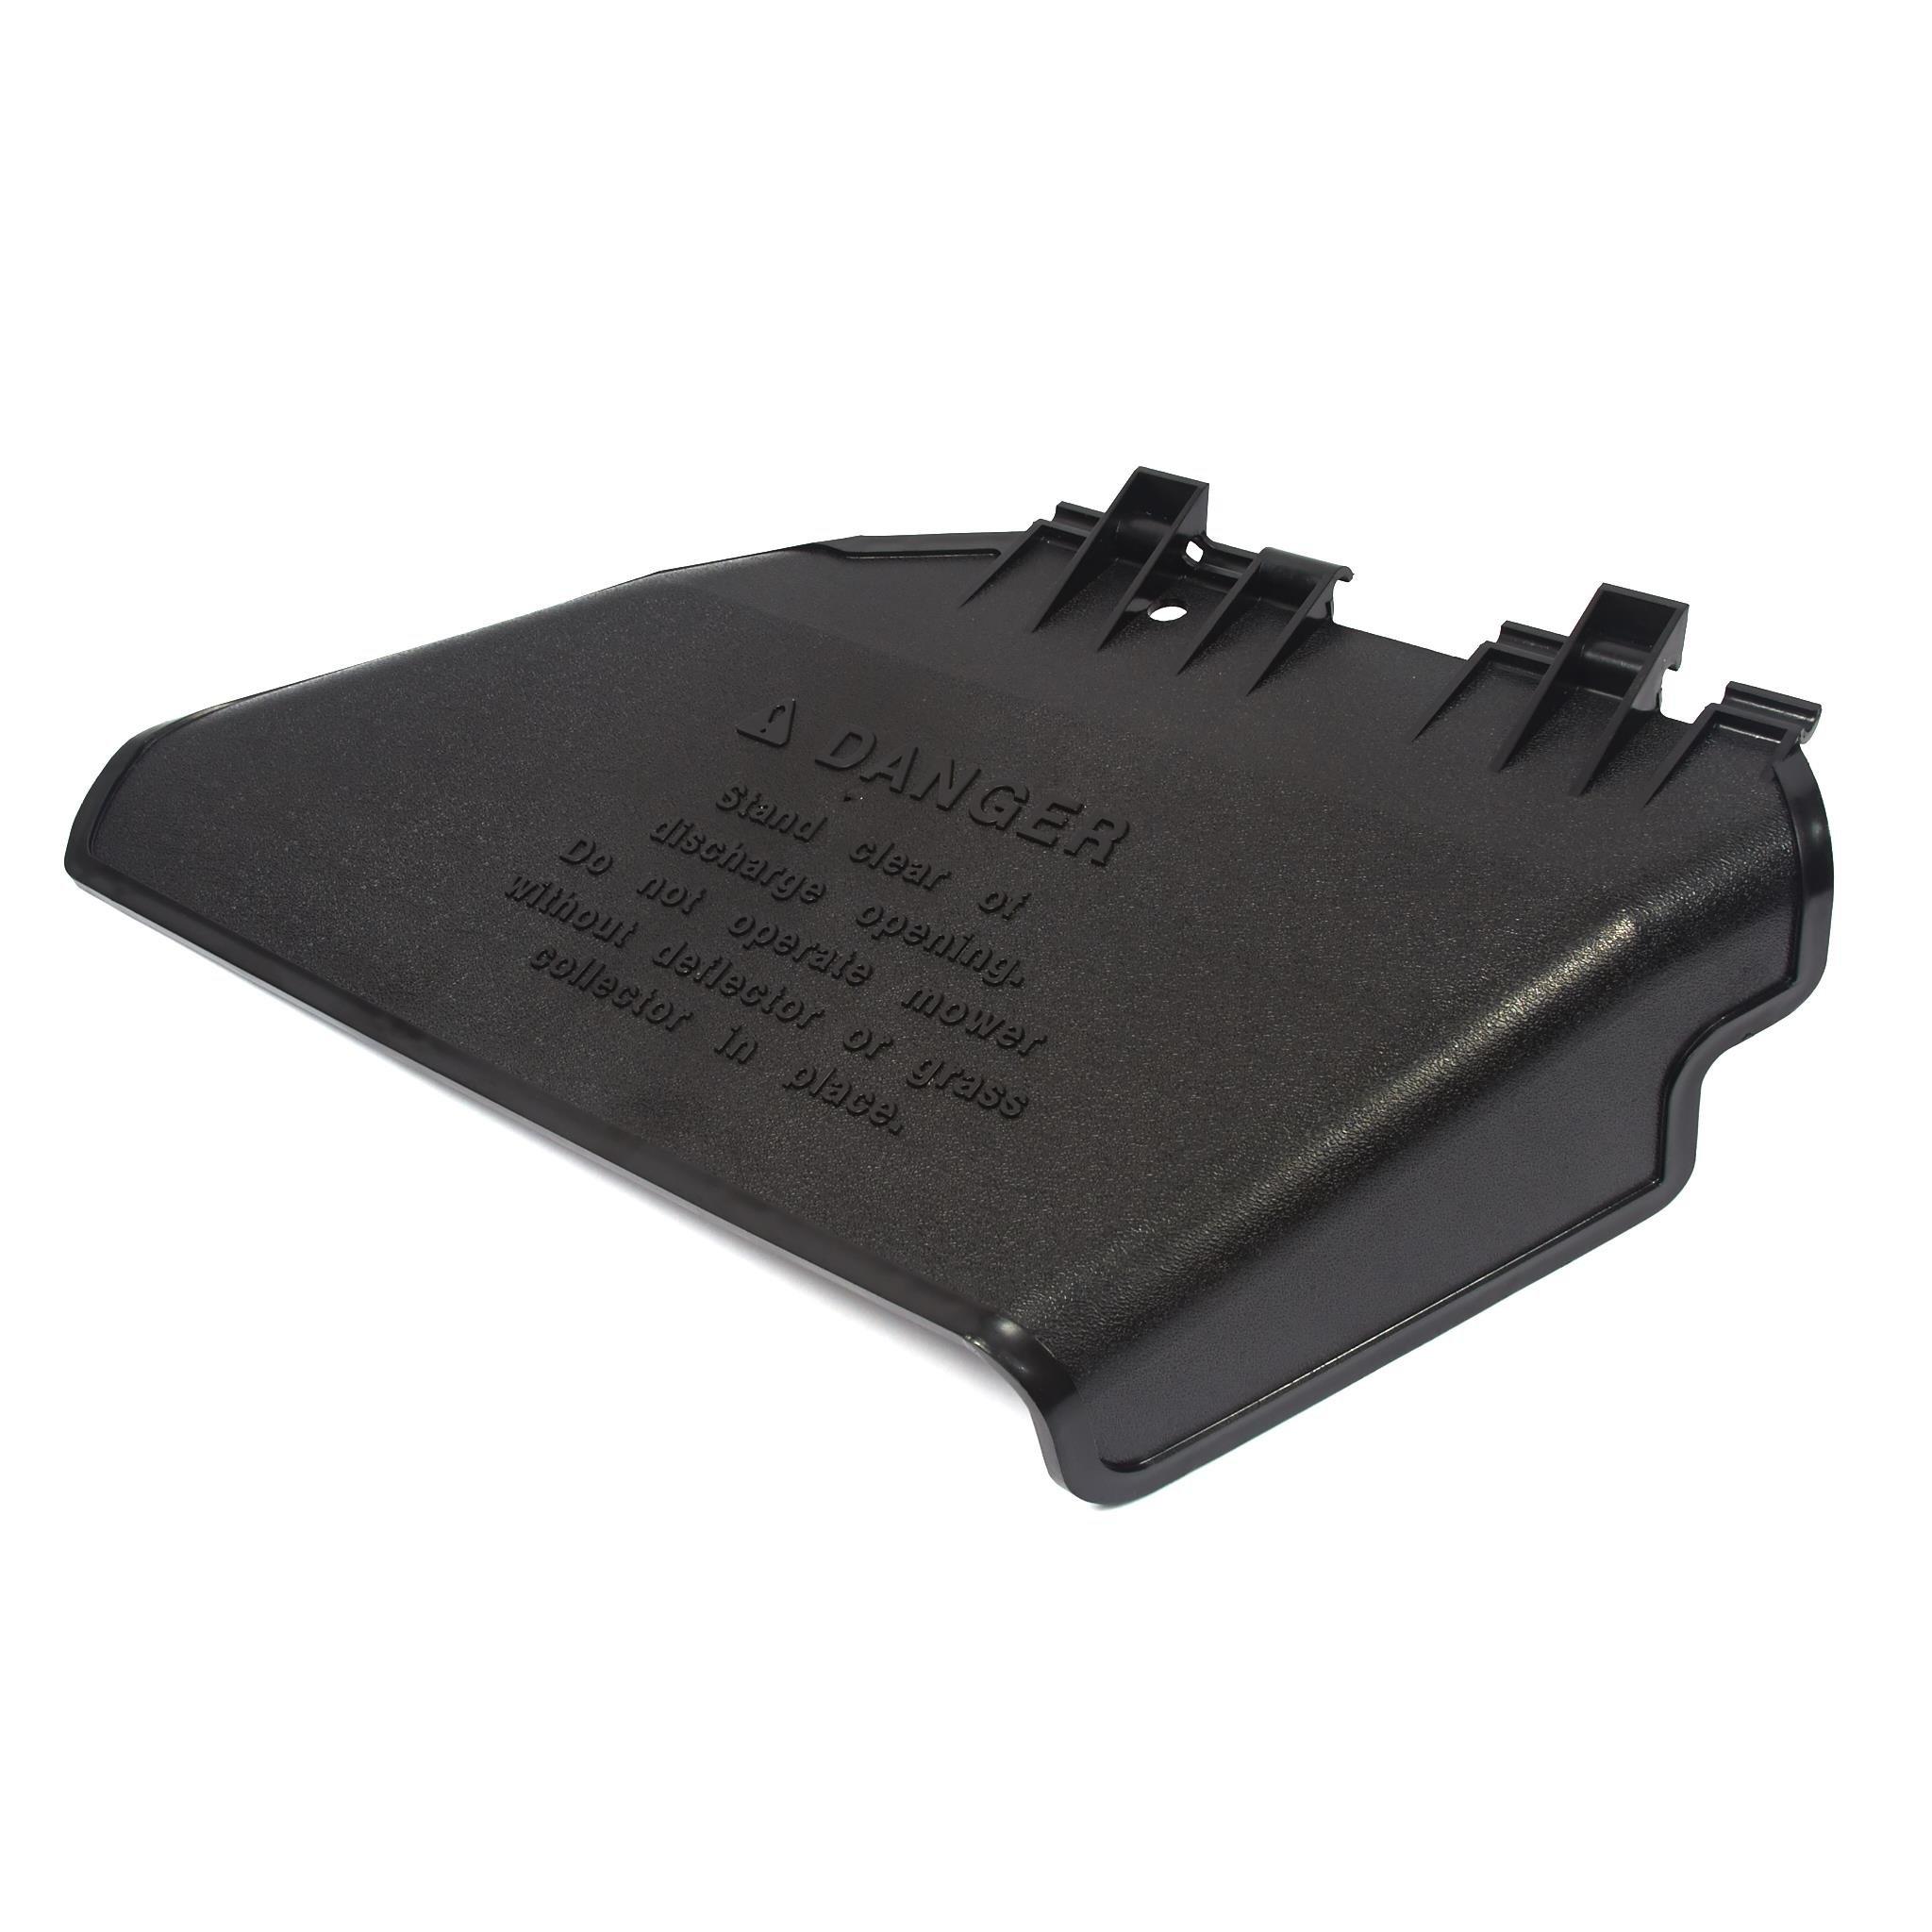 Briggs and Stratton 1705449SM Deflector, Black